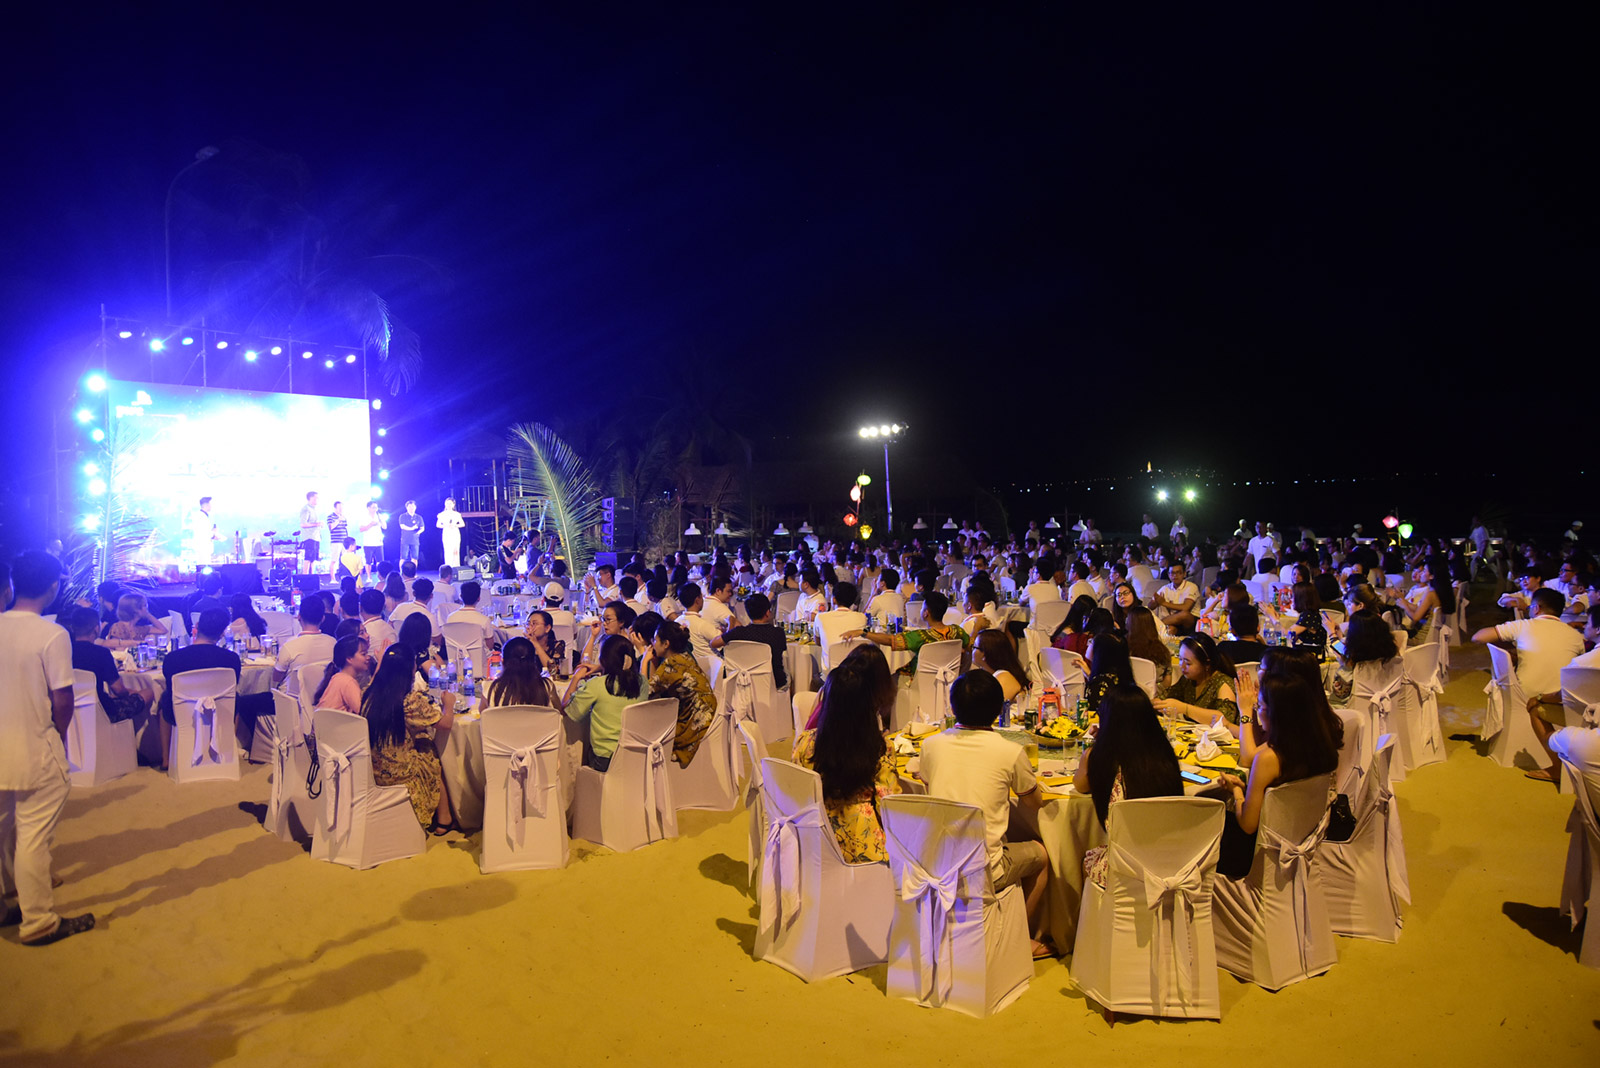 PWC VIETNAM 25TH YEARS CEREMONY AT ARIYANA CONVENTION CENTRE